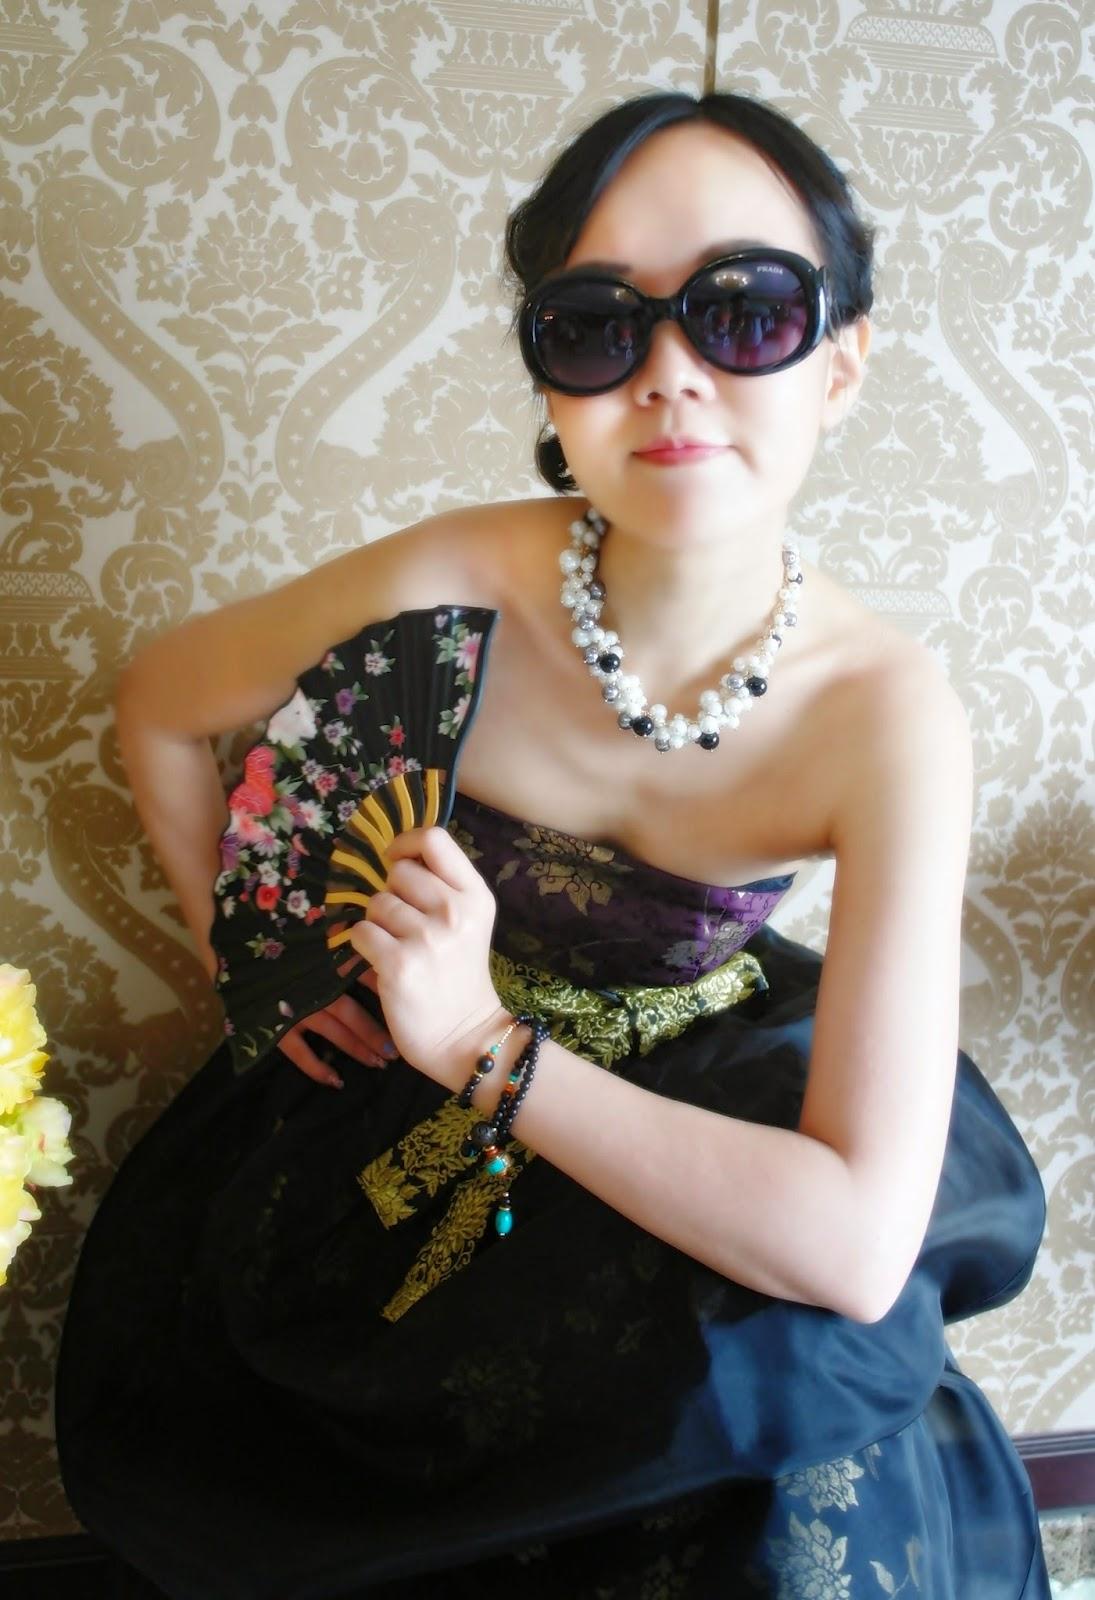 Moranbaepil Modern Fusion Hanbok 퓨전한복 | meheartsoul.blogspot.com